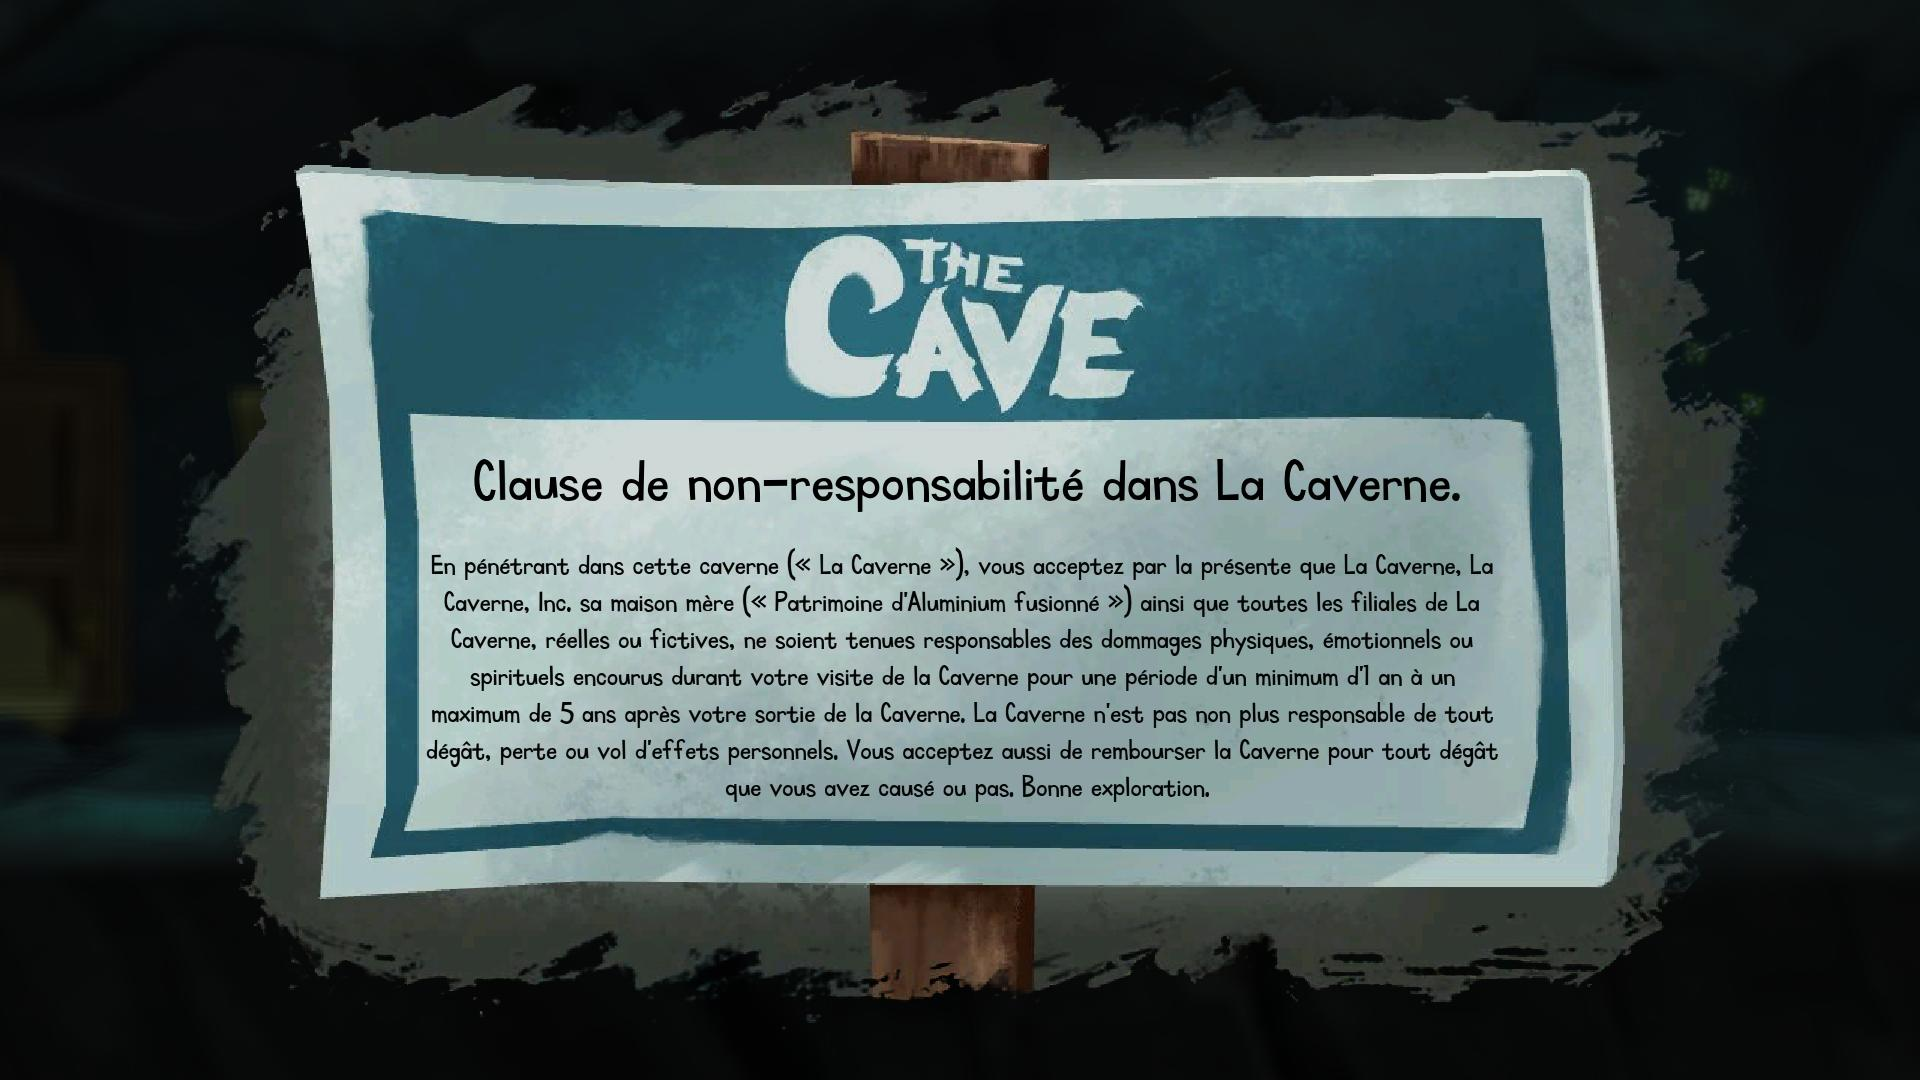 Cave 2013-01-24 02-16-57-23